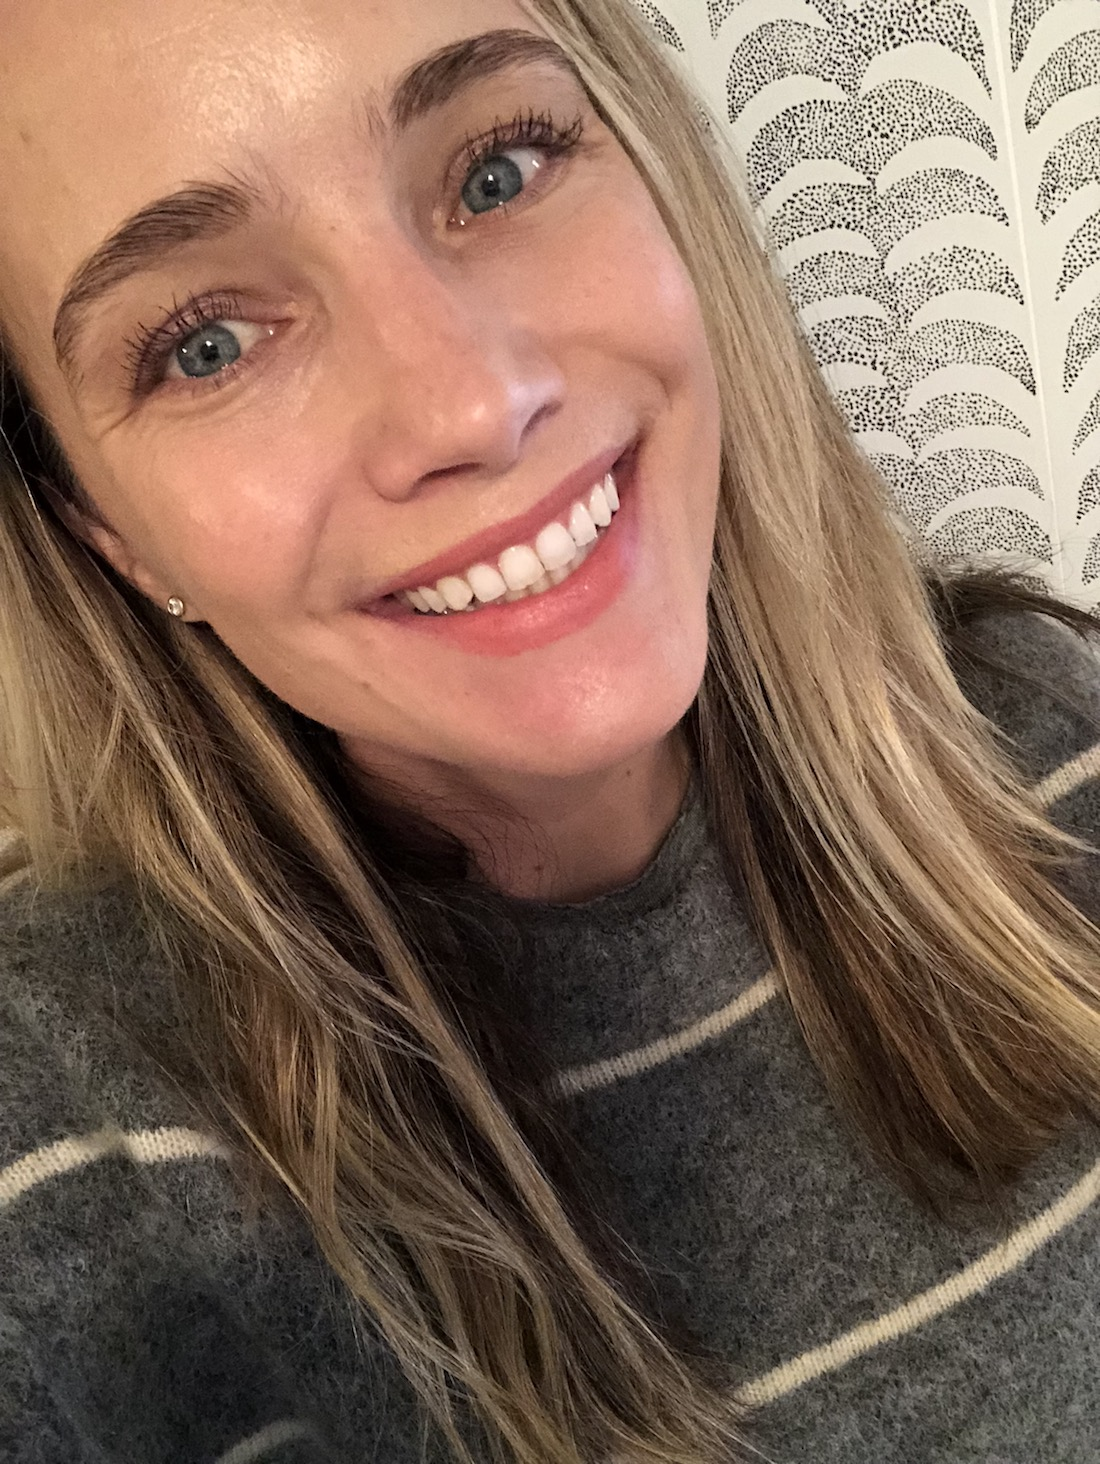 Nars Climax Mascara Review After Photos